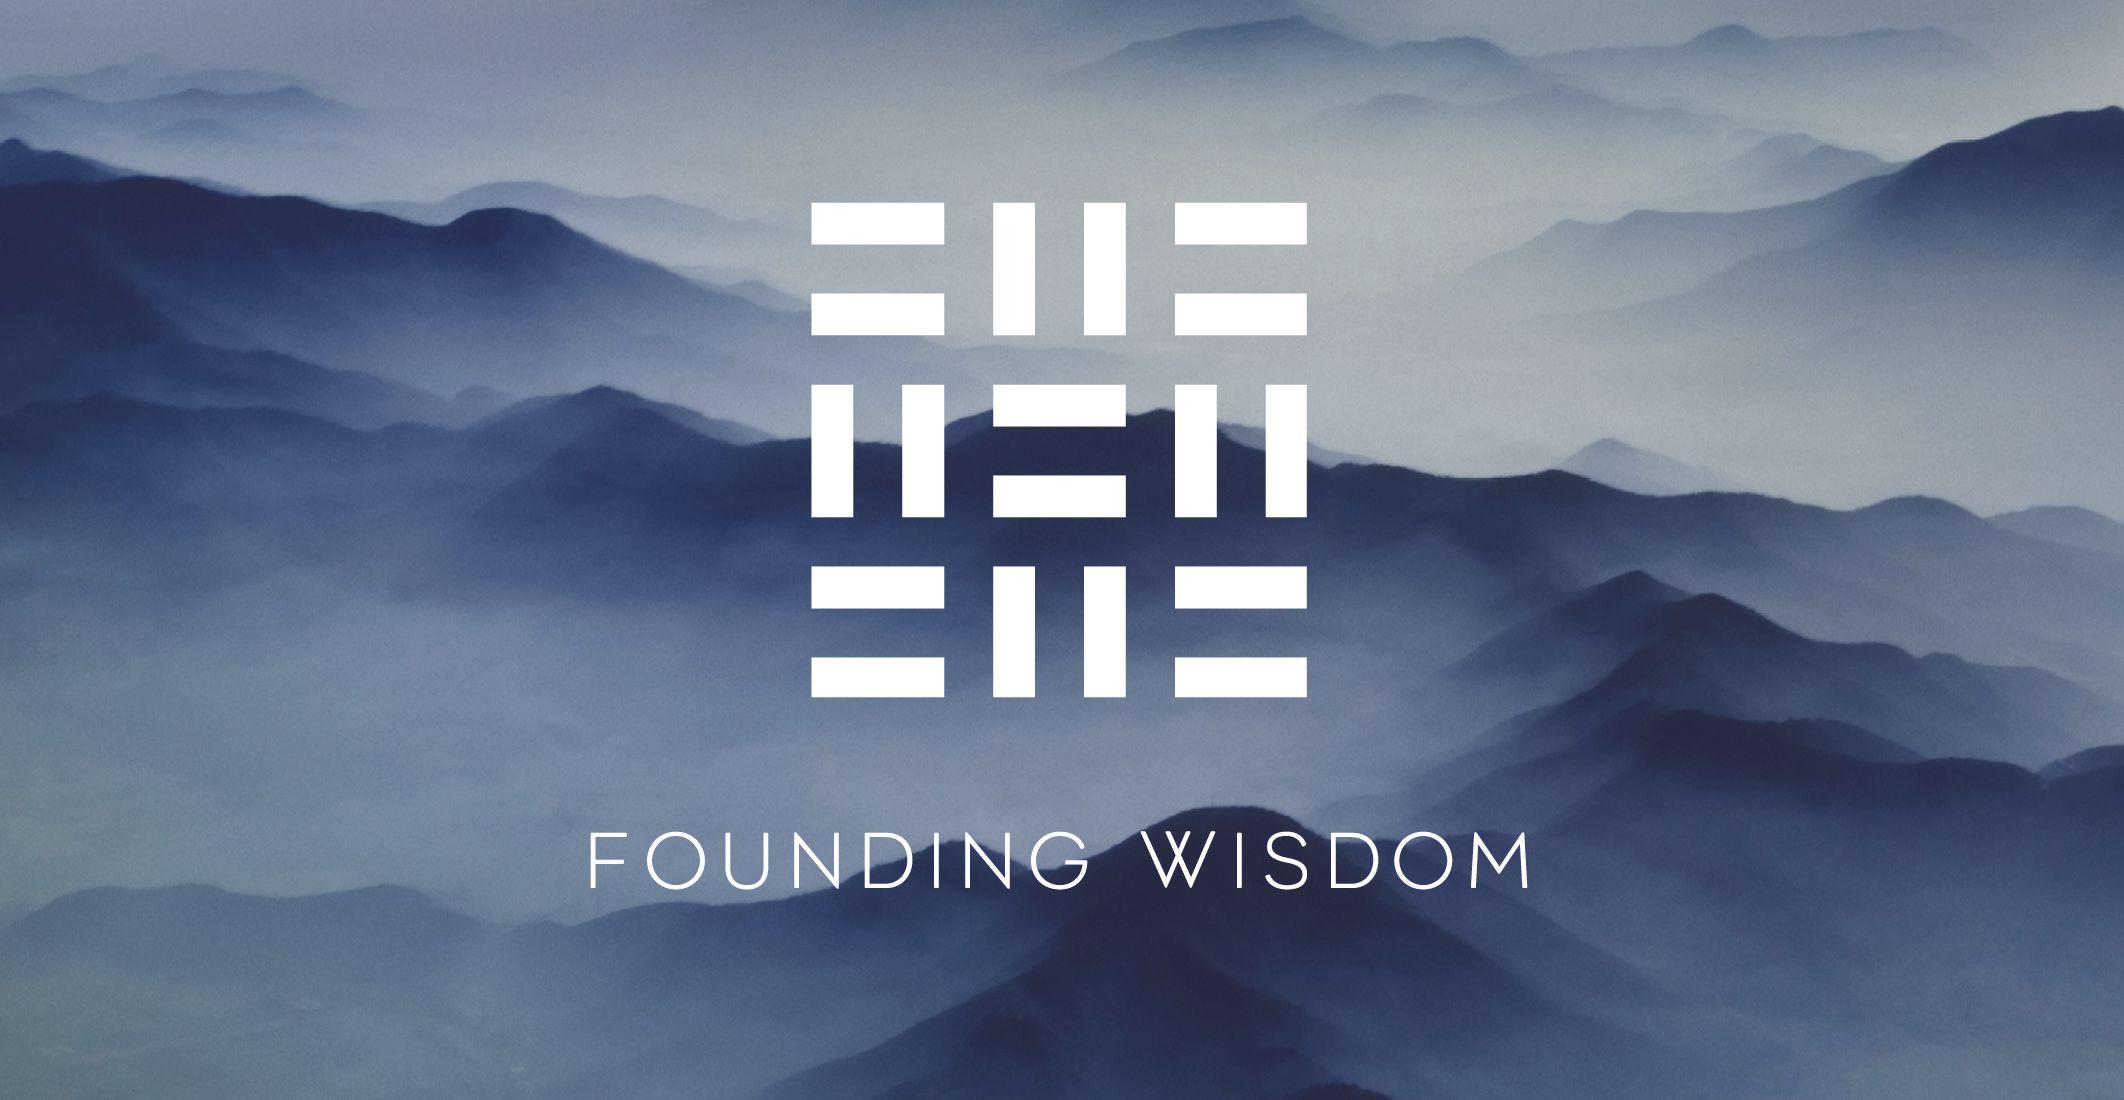 founding-wisdom-uffindell